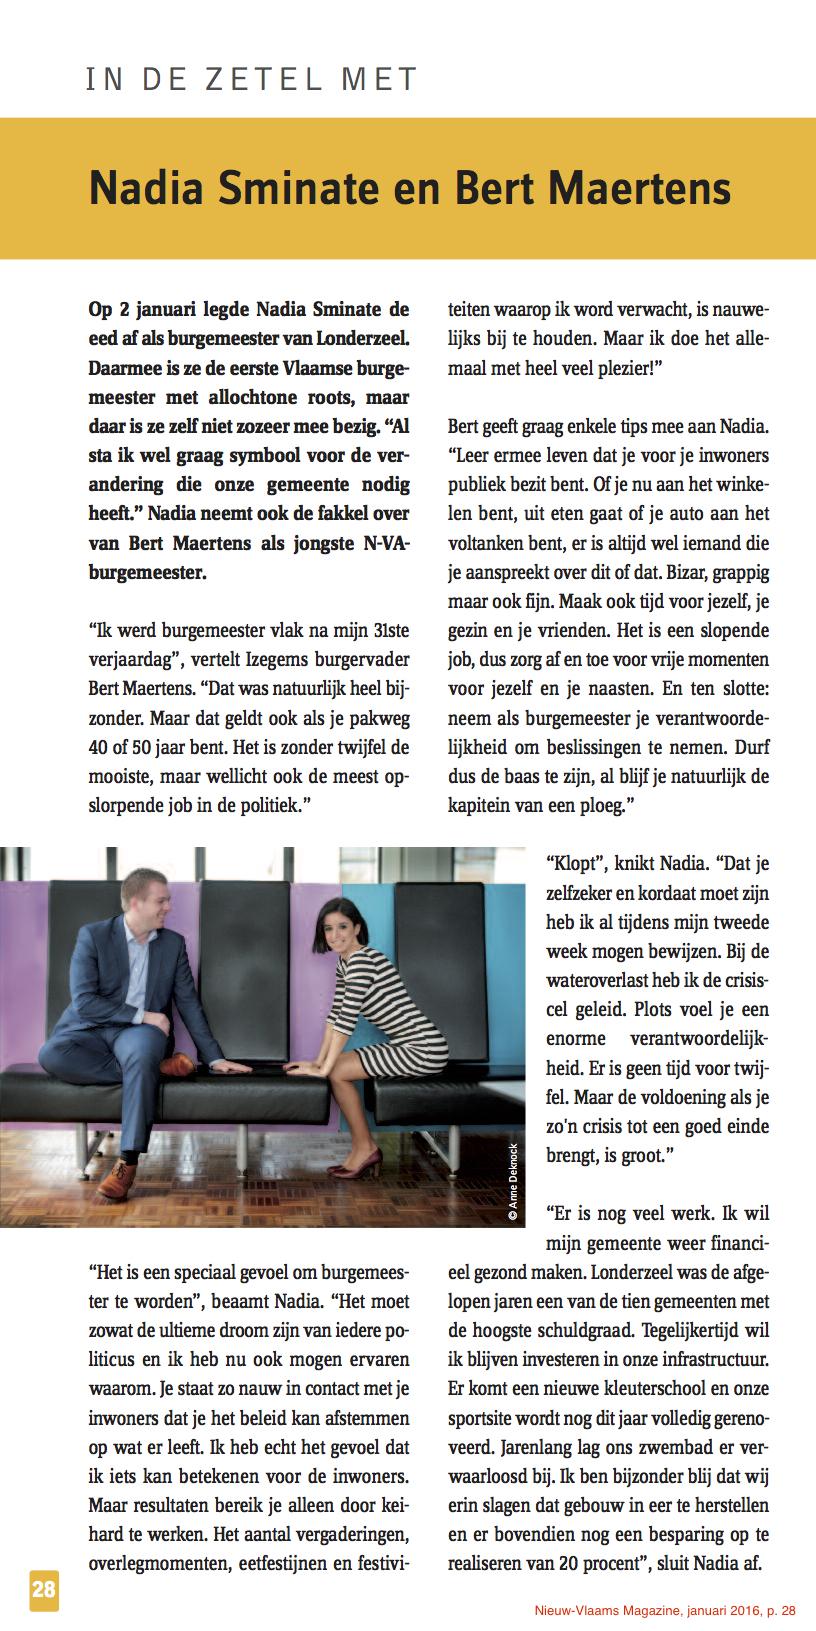 Nieuw-Vlaams Magazine, januari 2016